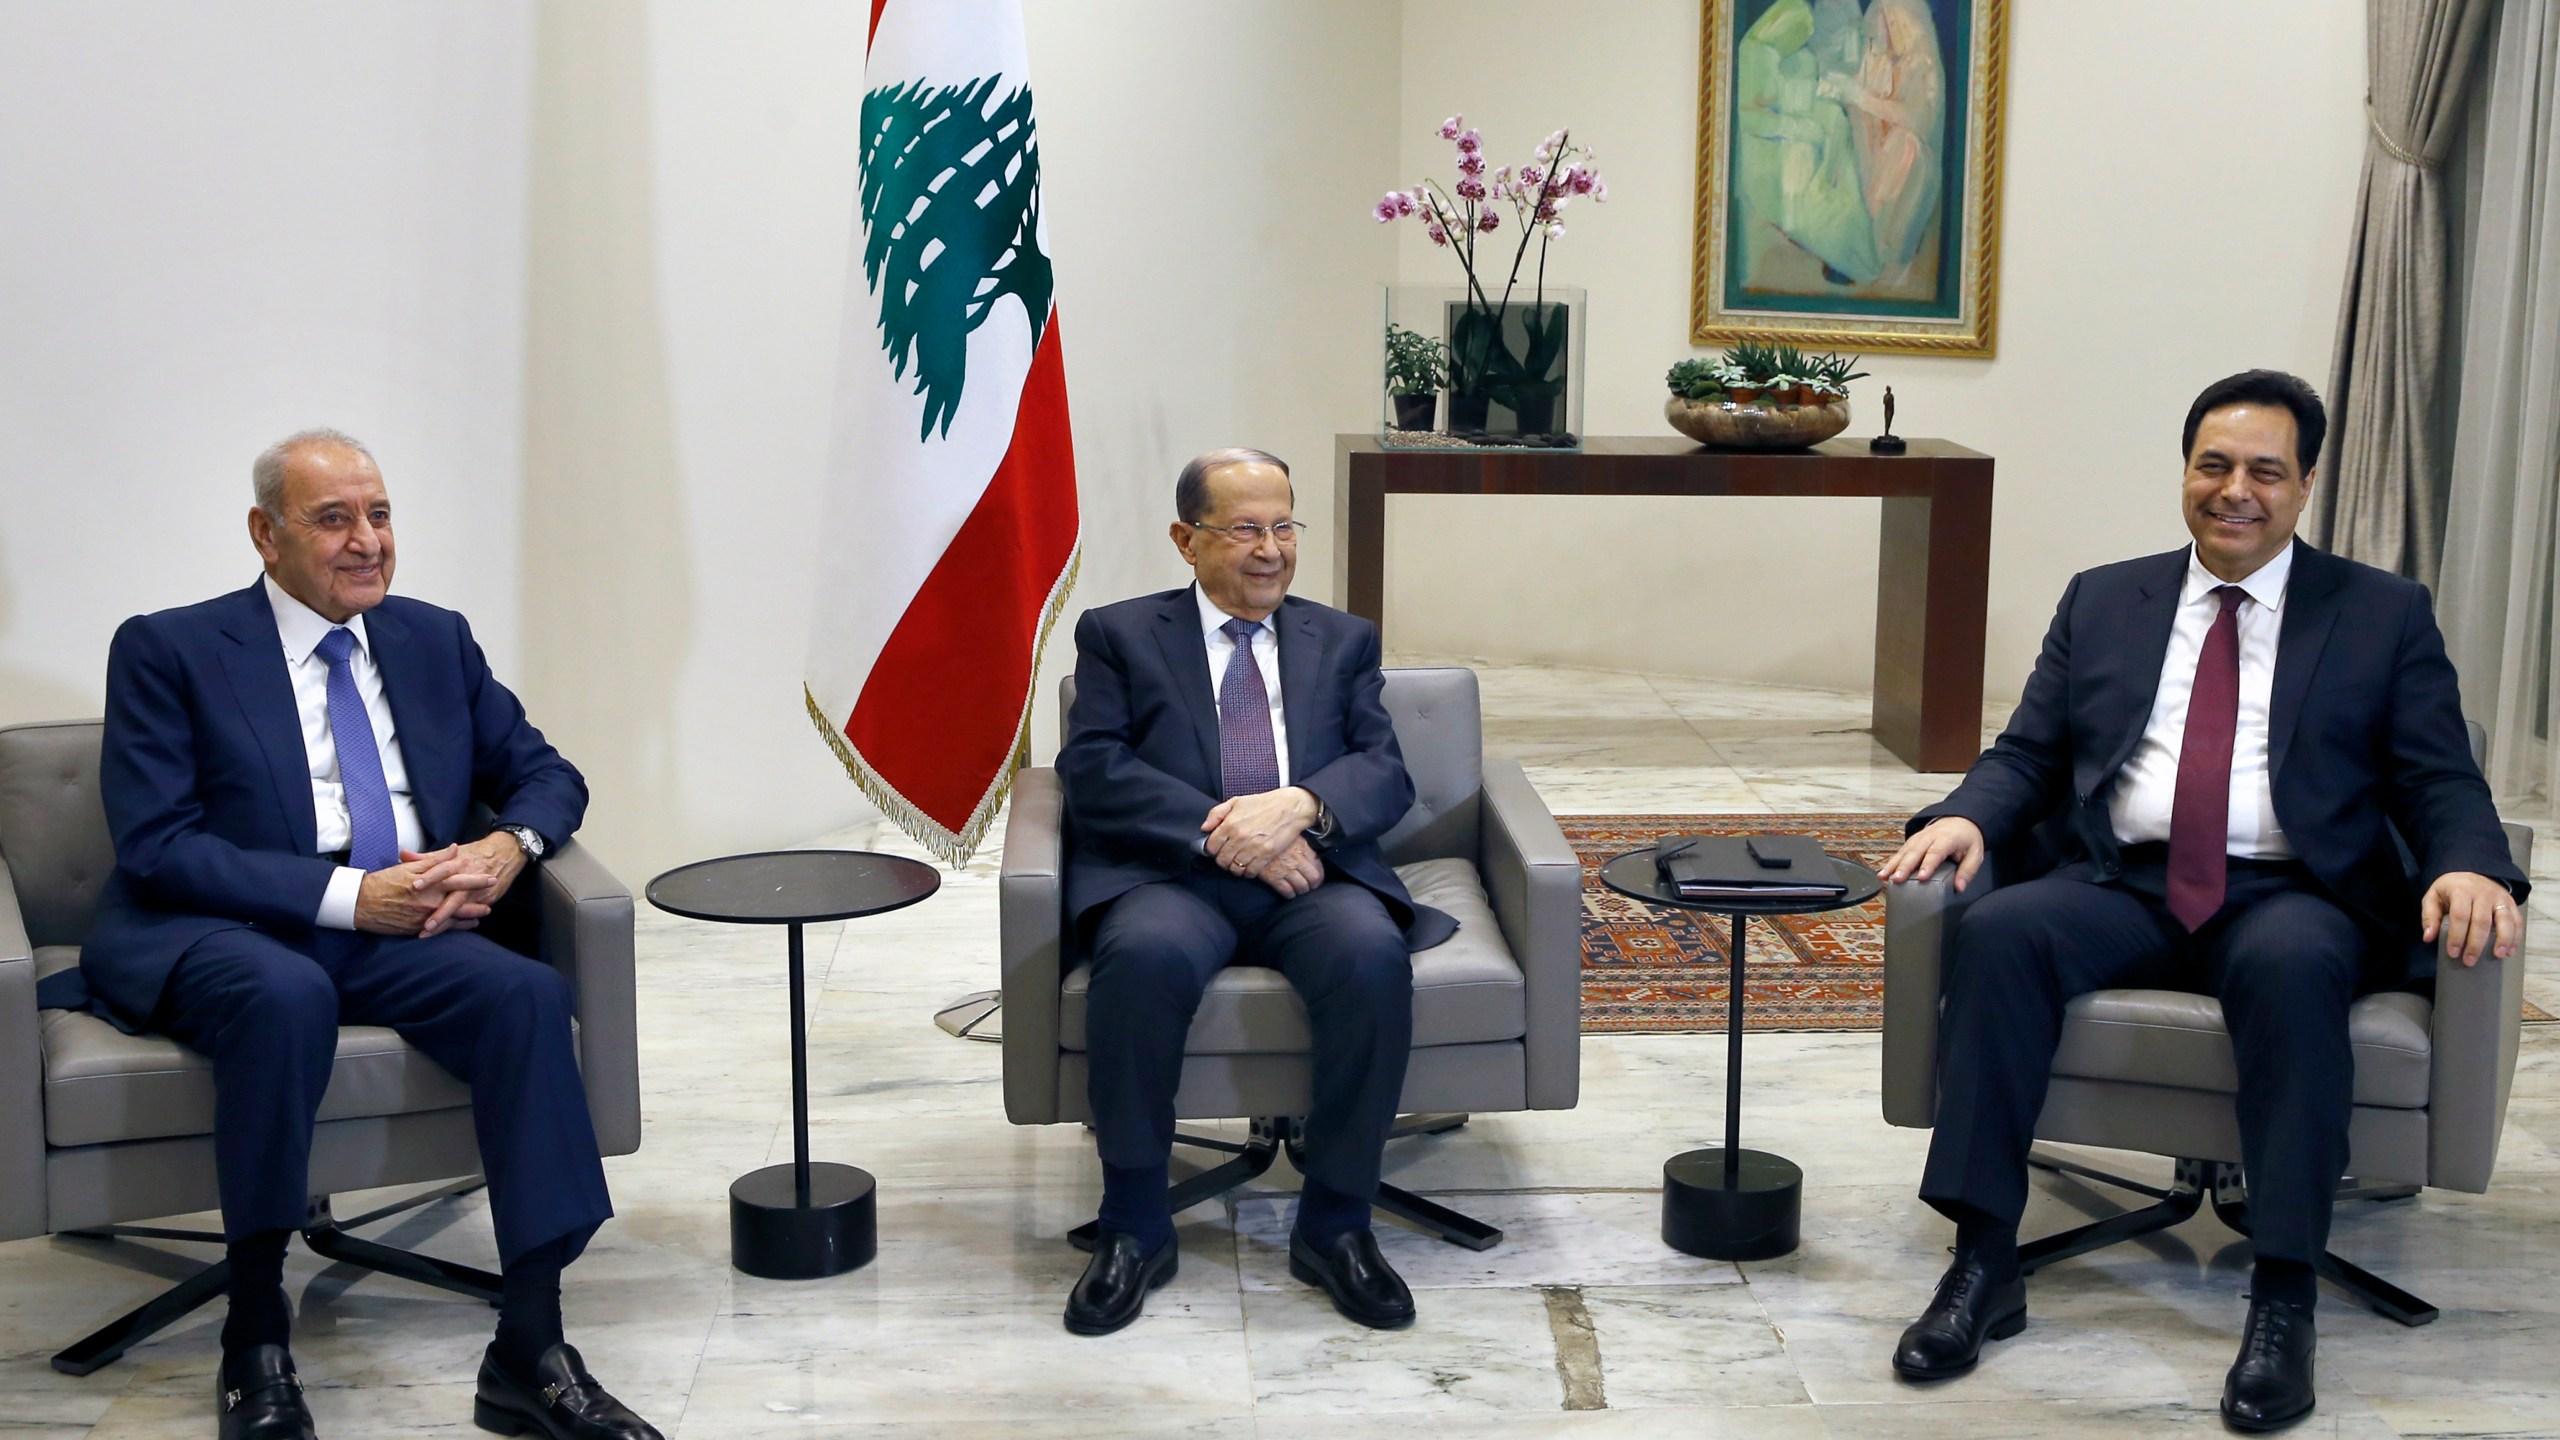 Michel Aoun, Nabih Berri, Hassan Diab